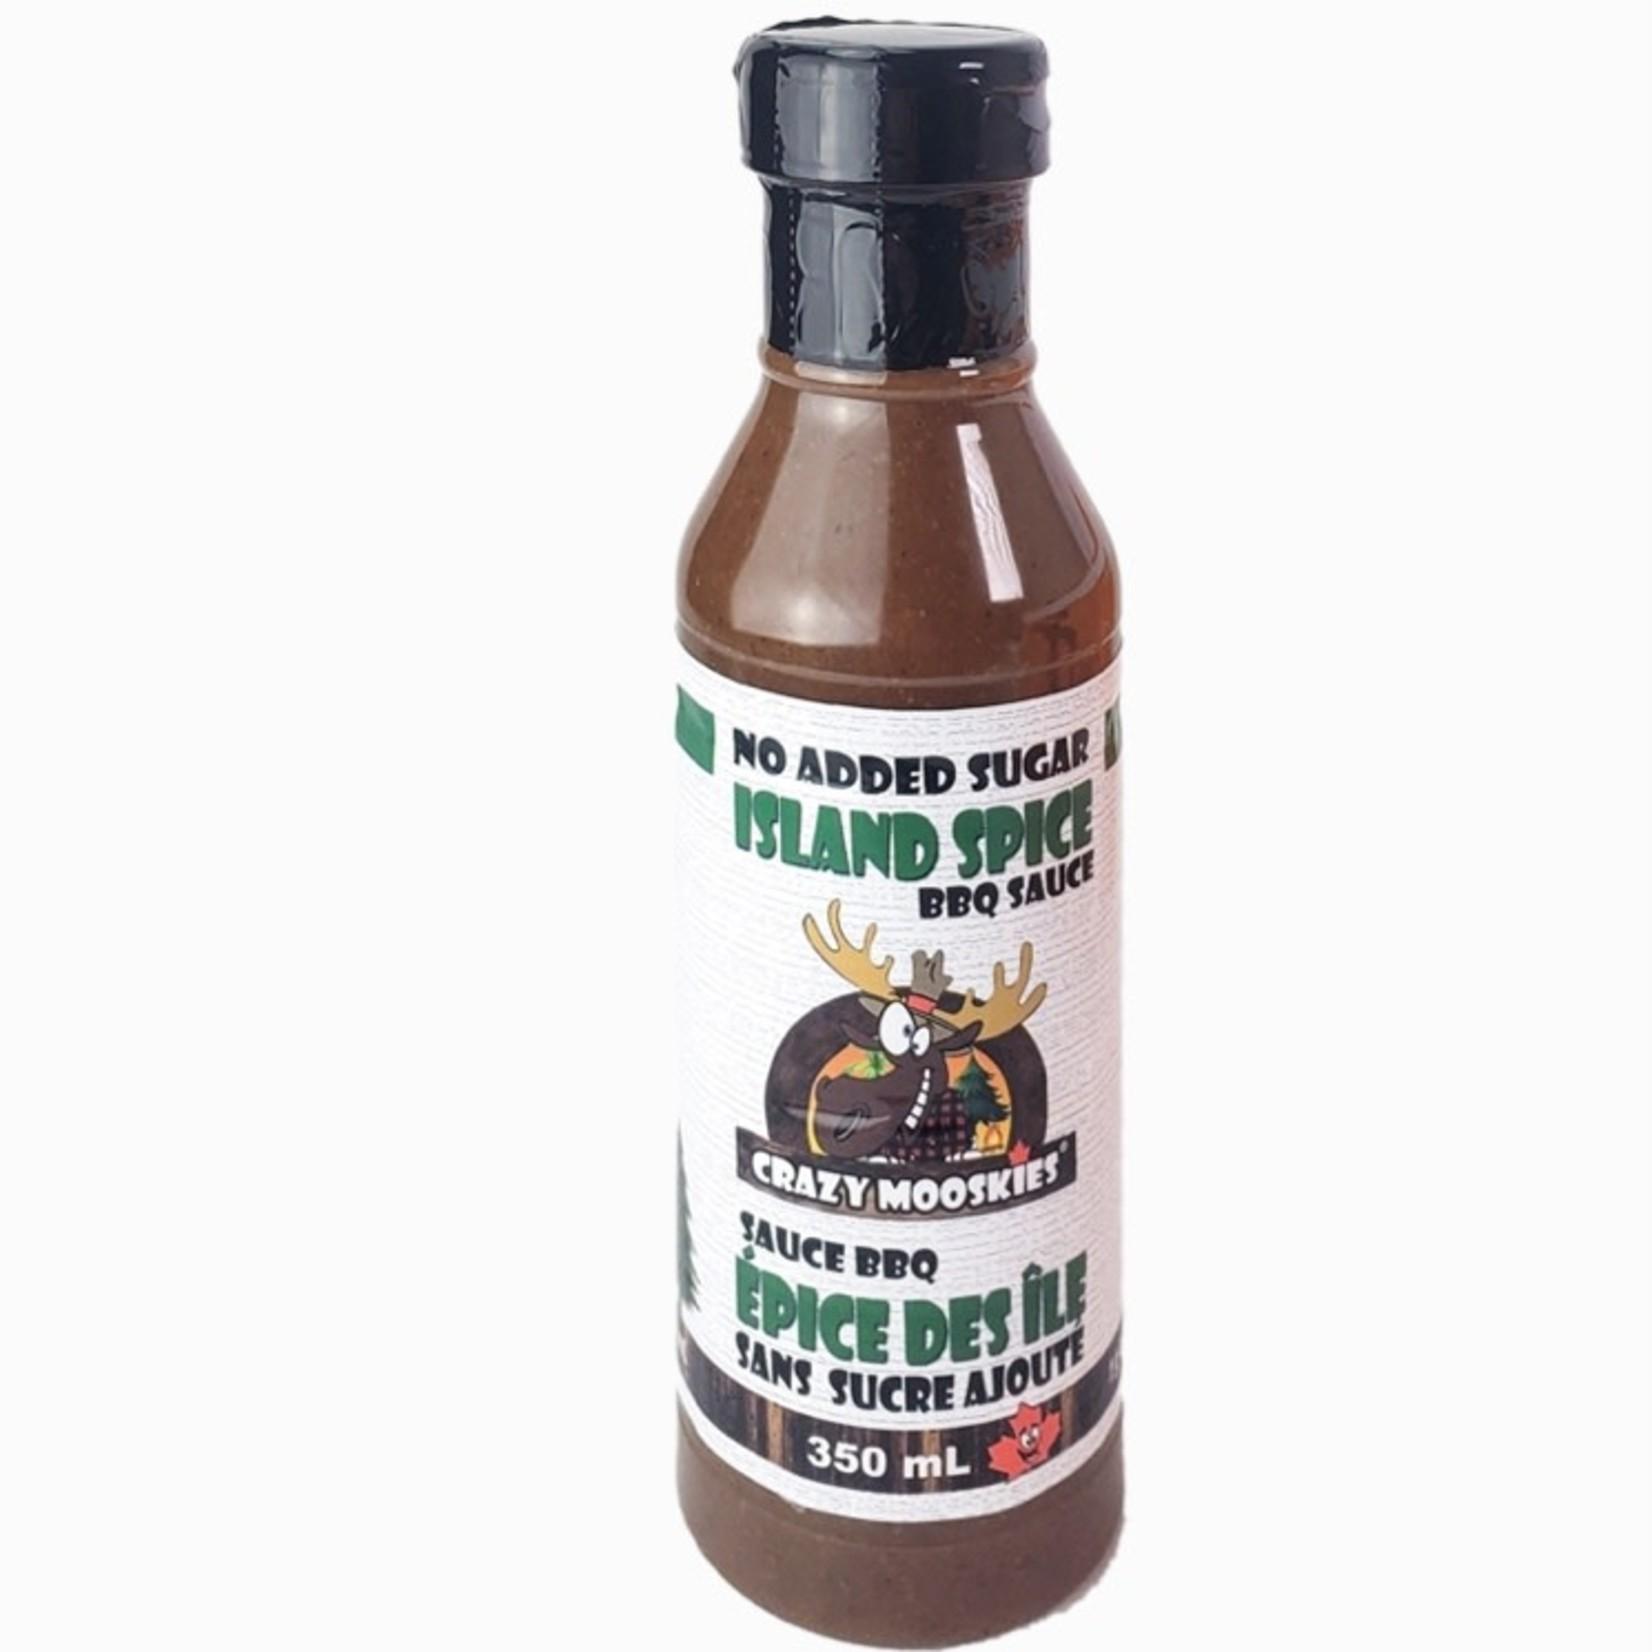 Crazy Mooskies Crazy Mooskies Island Spice BBQ Sauce 350ml